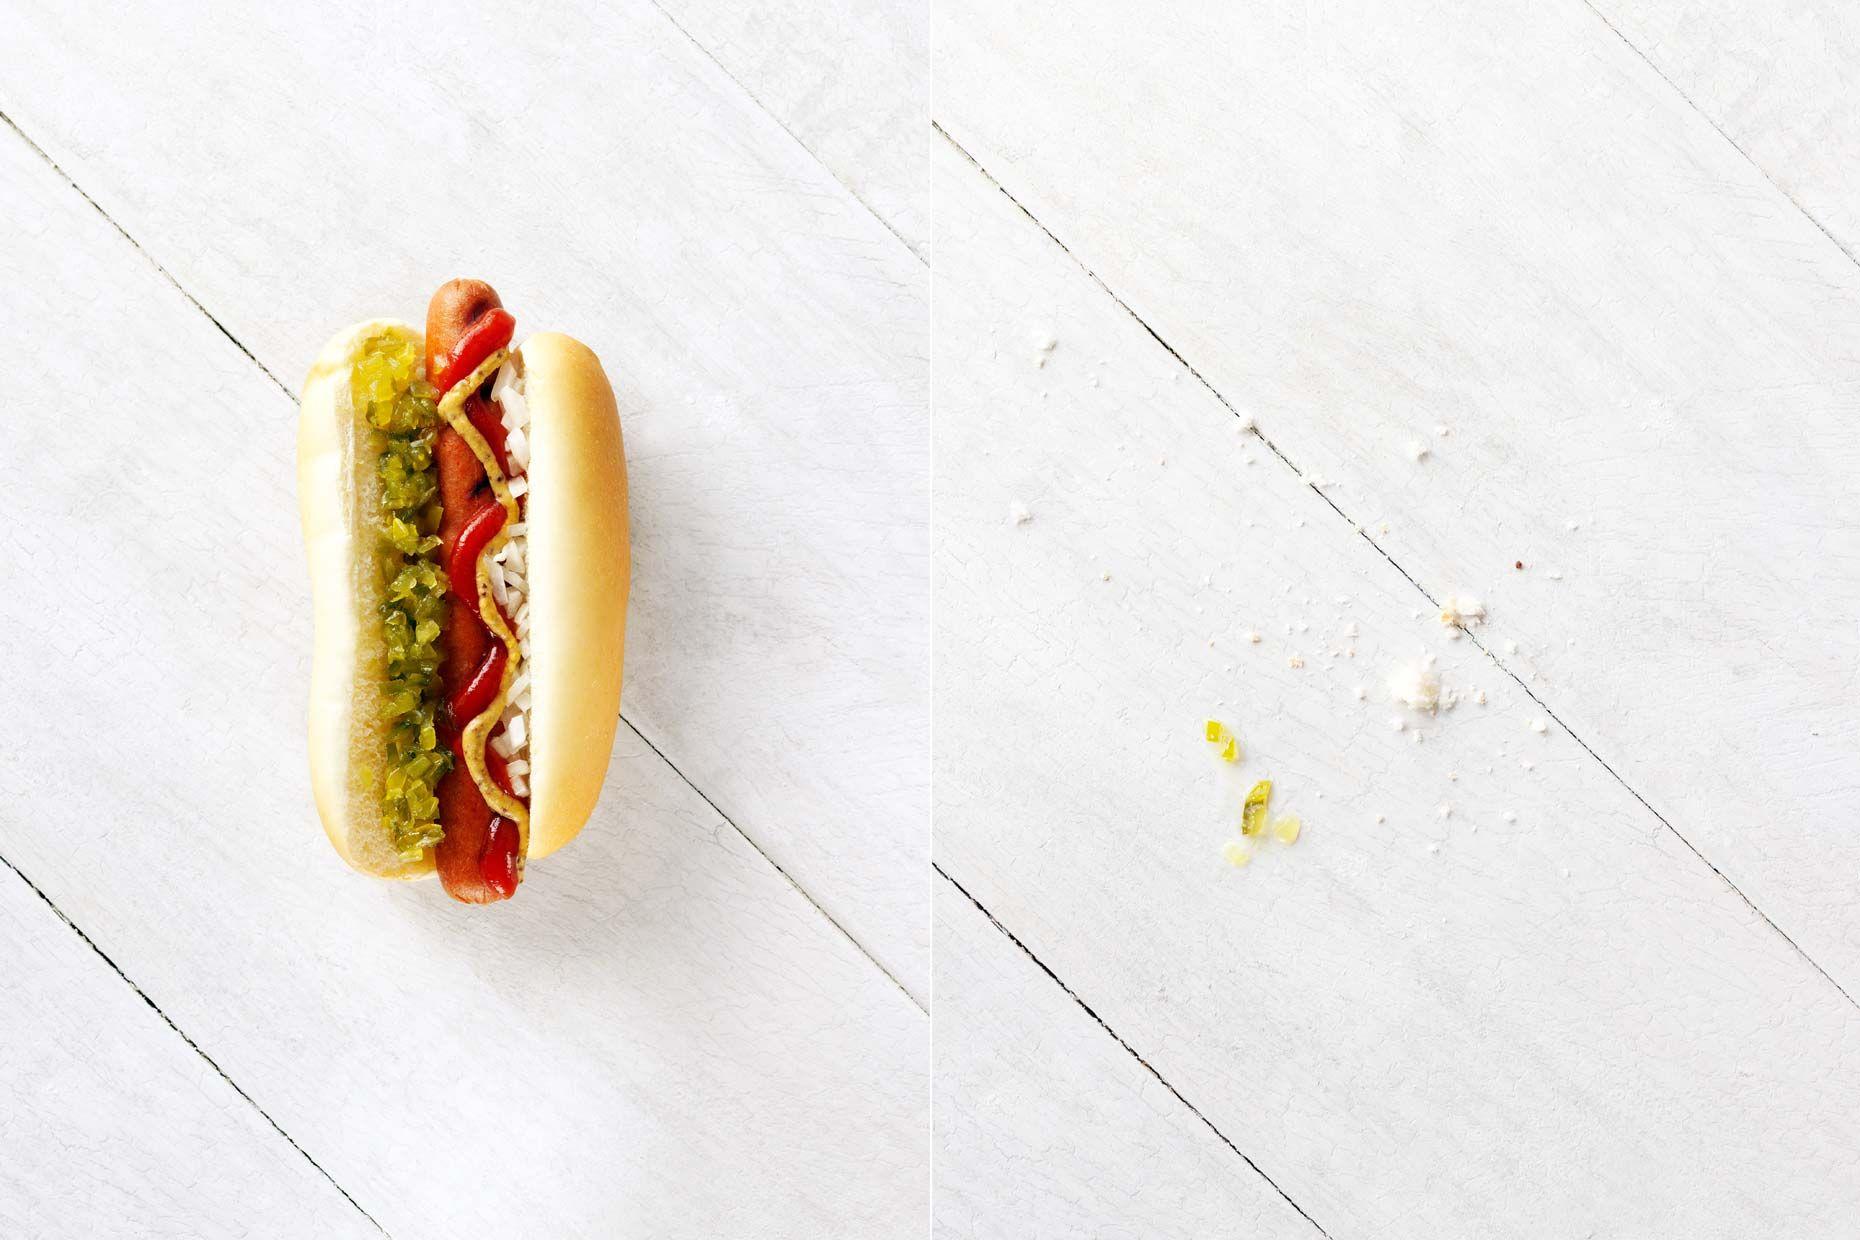 adrian mueller still life / food / liquids photographer new york | portfolio | 58